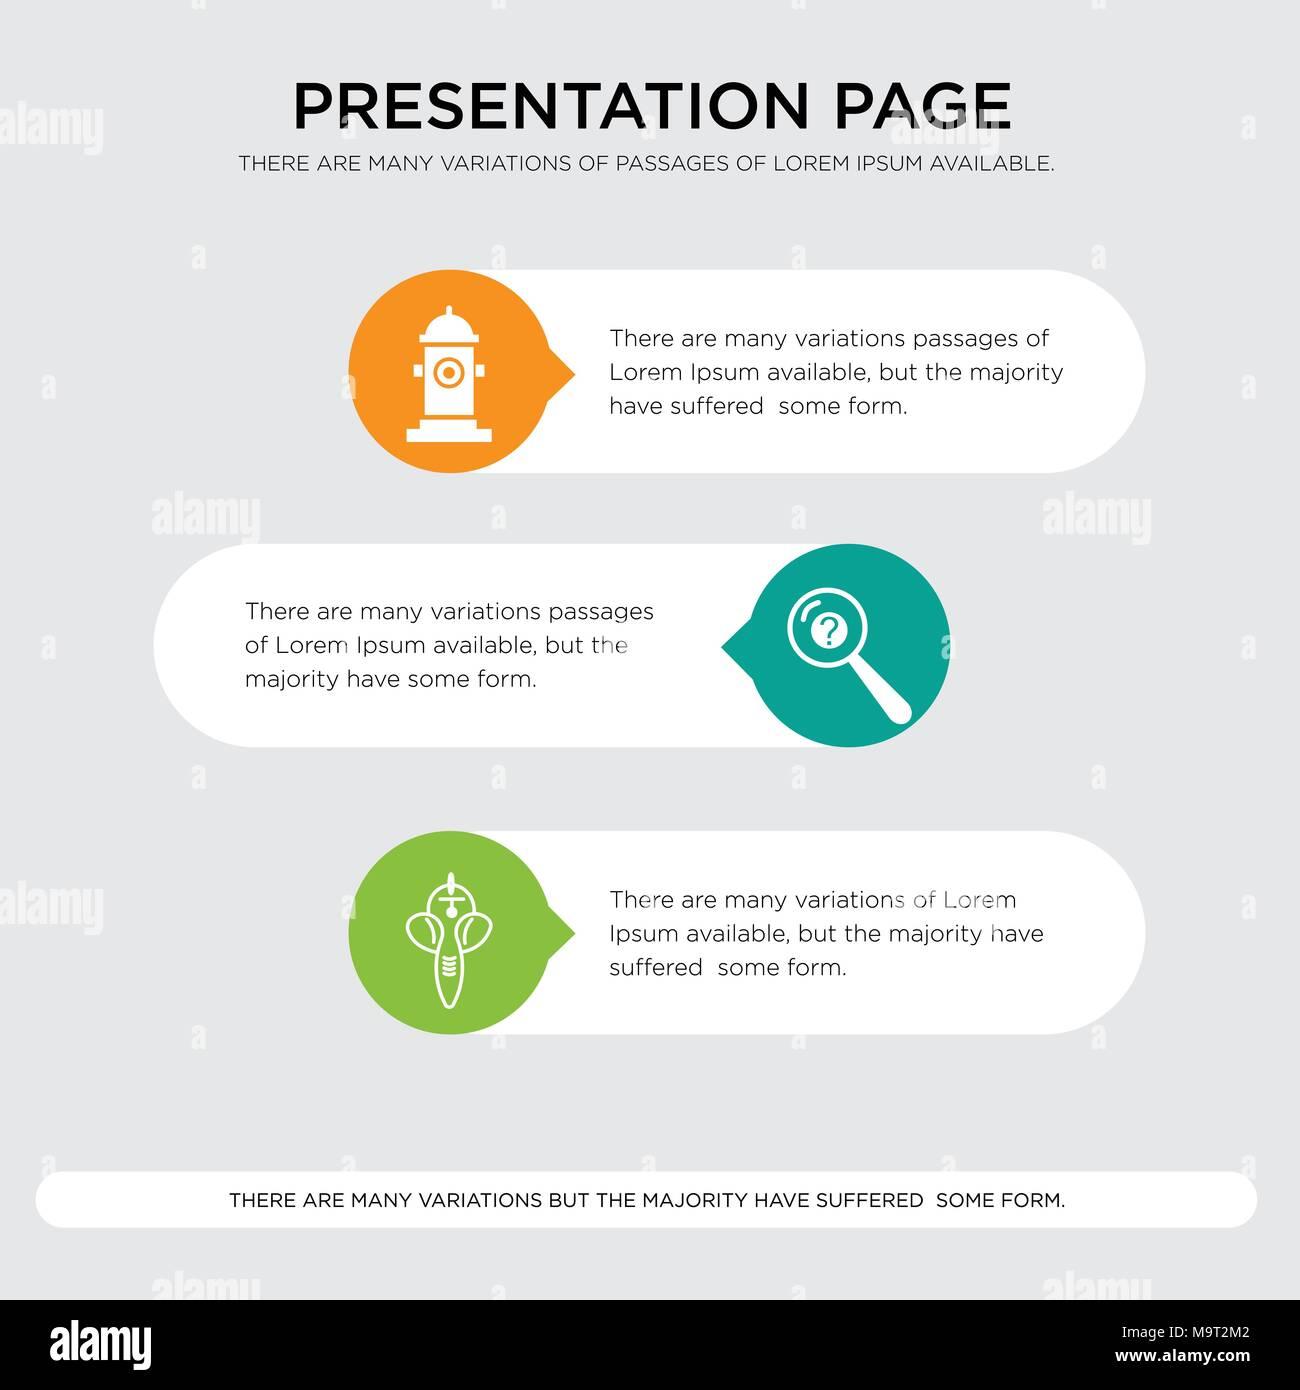 ganesh inquiry fire hydrant presentation design template in orange